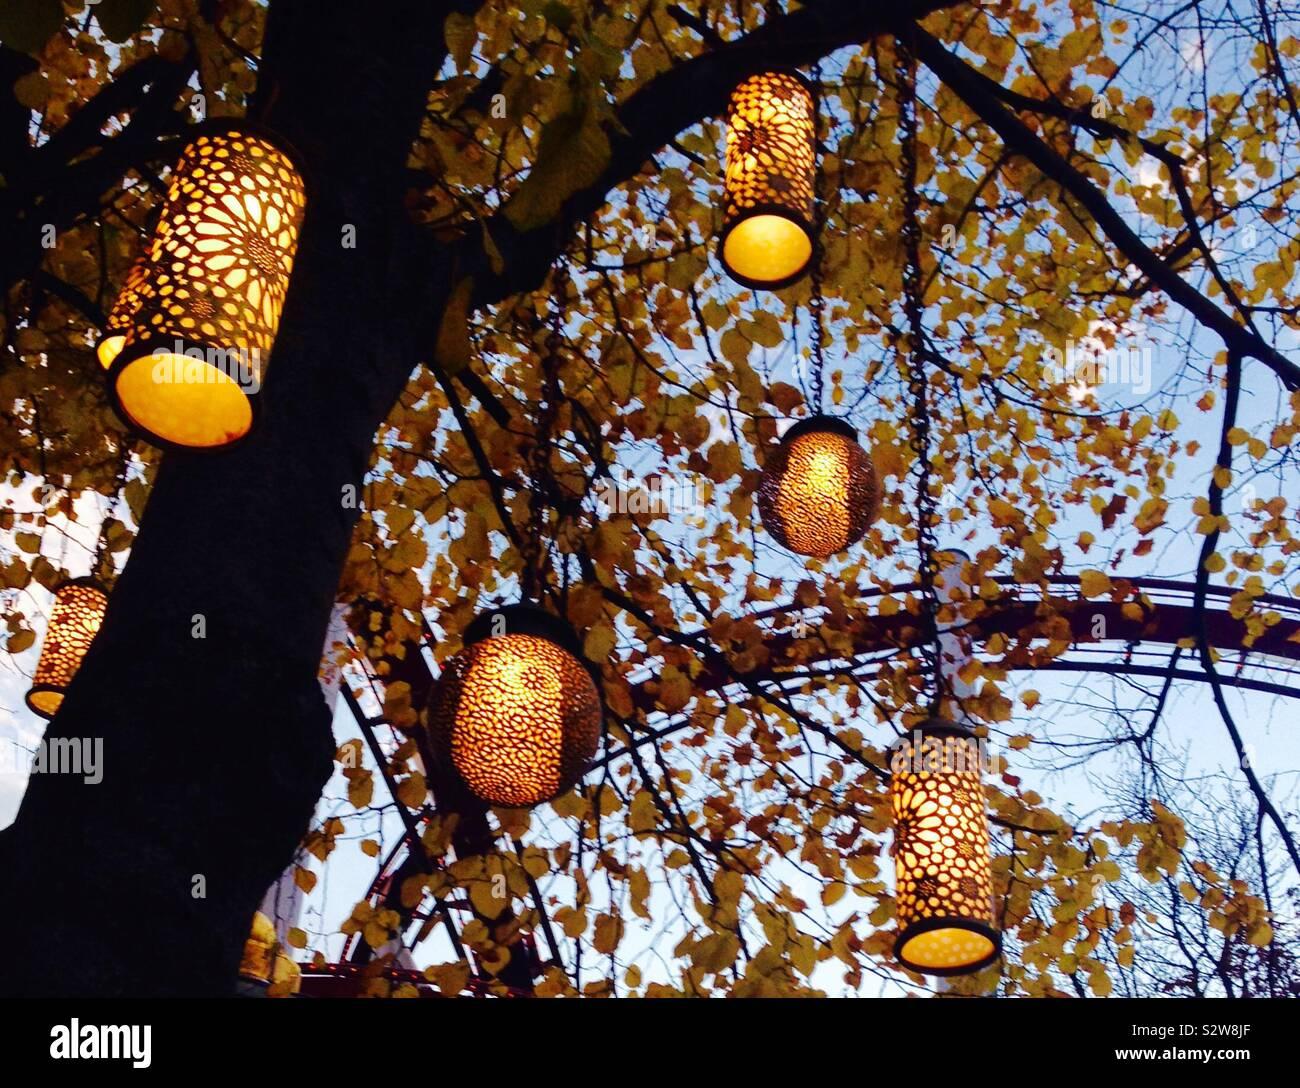 Fairytale Lanterns Hanging From Trees And Illuminating The Park Taken In Tivoli Gardens Kobenhavn Copenhagen Denmark Stock Photo Alamy